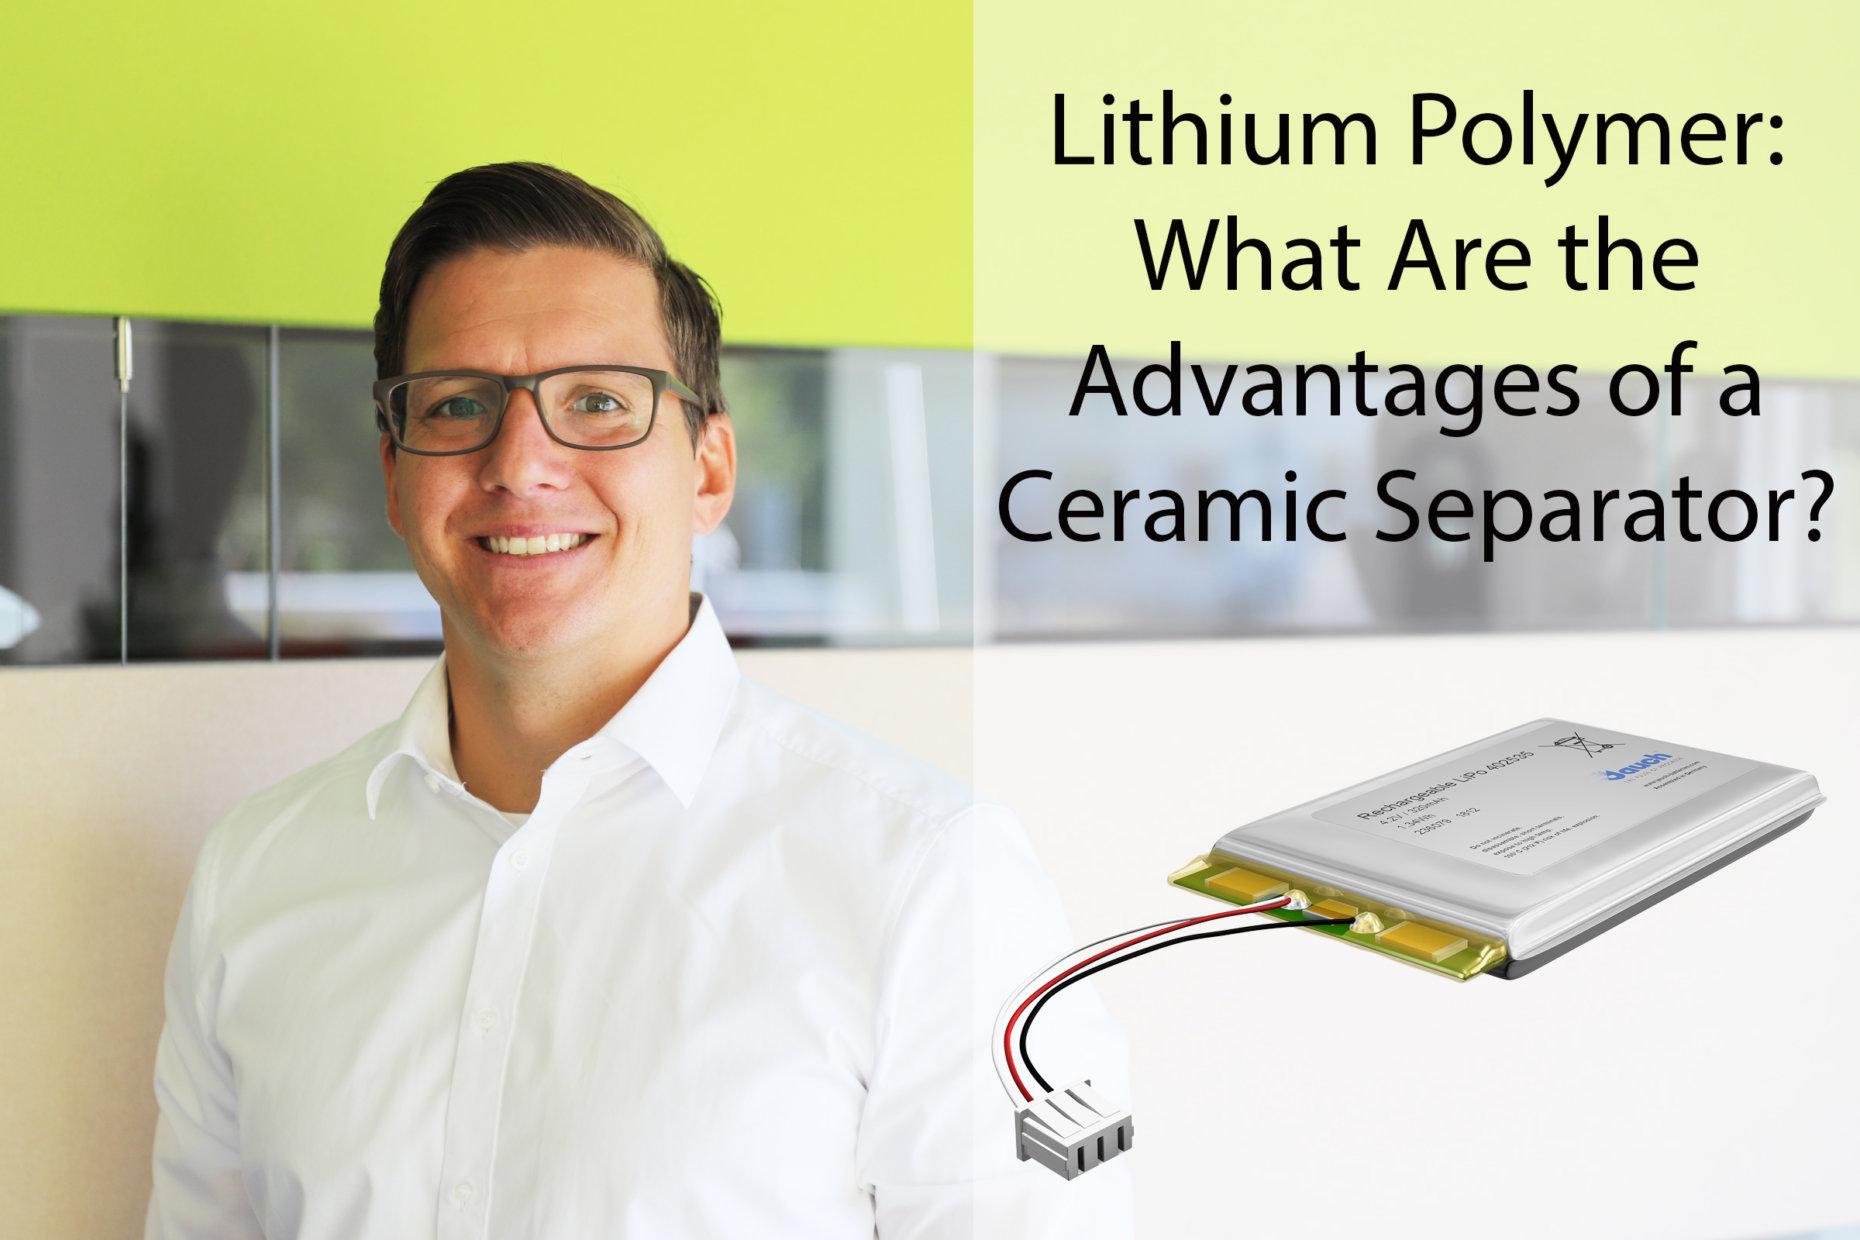 Viktor Sichwardt, Jauch-expert for lithium-polymer batteries